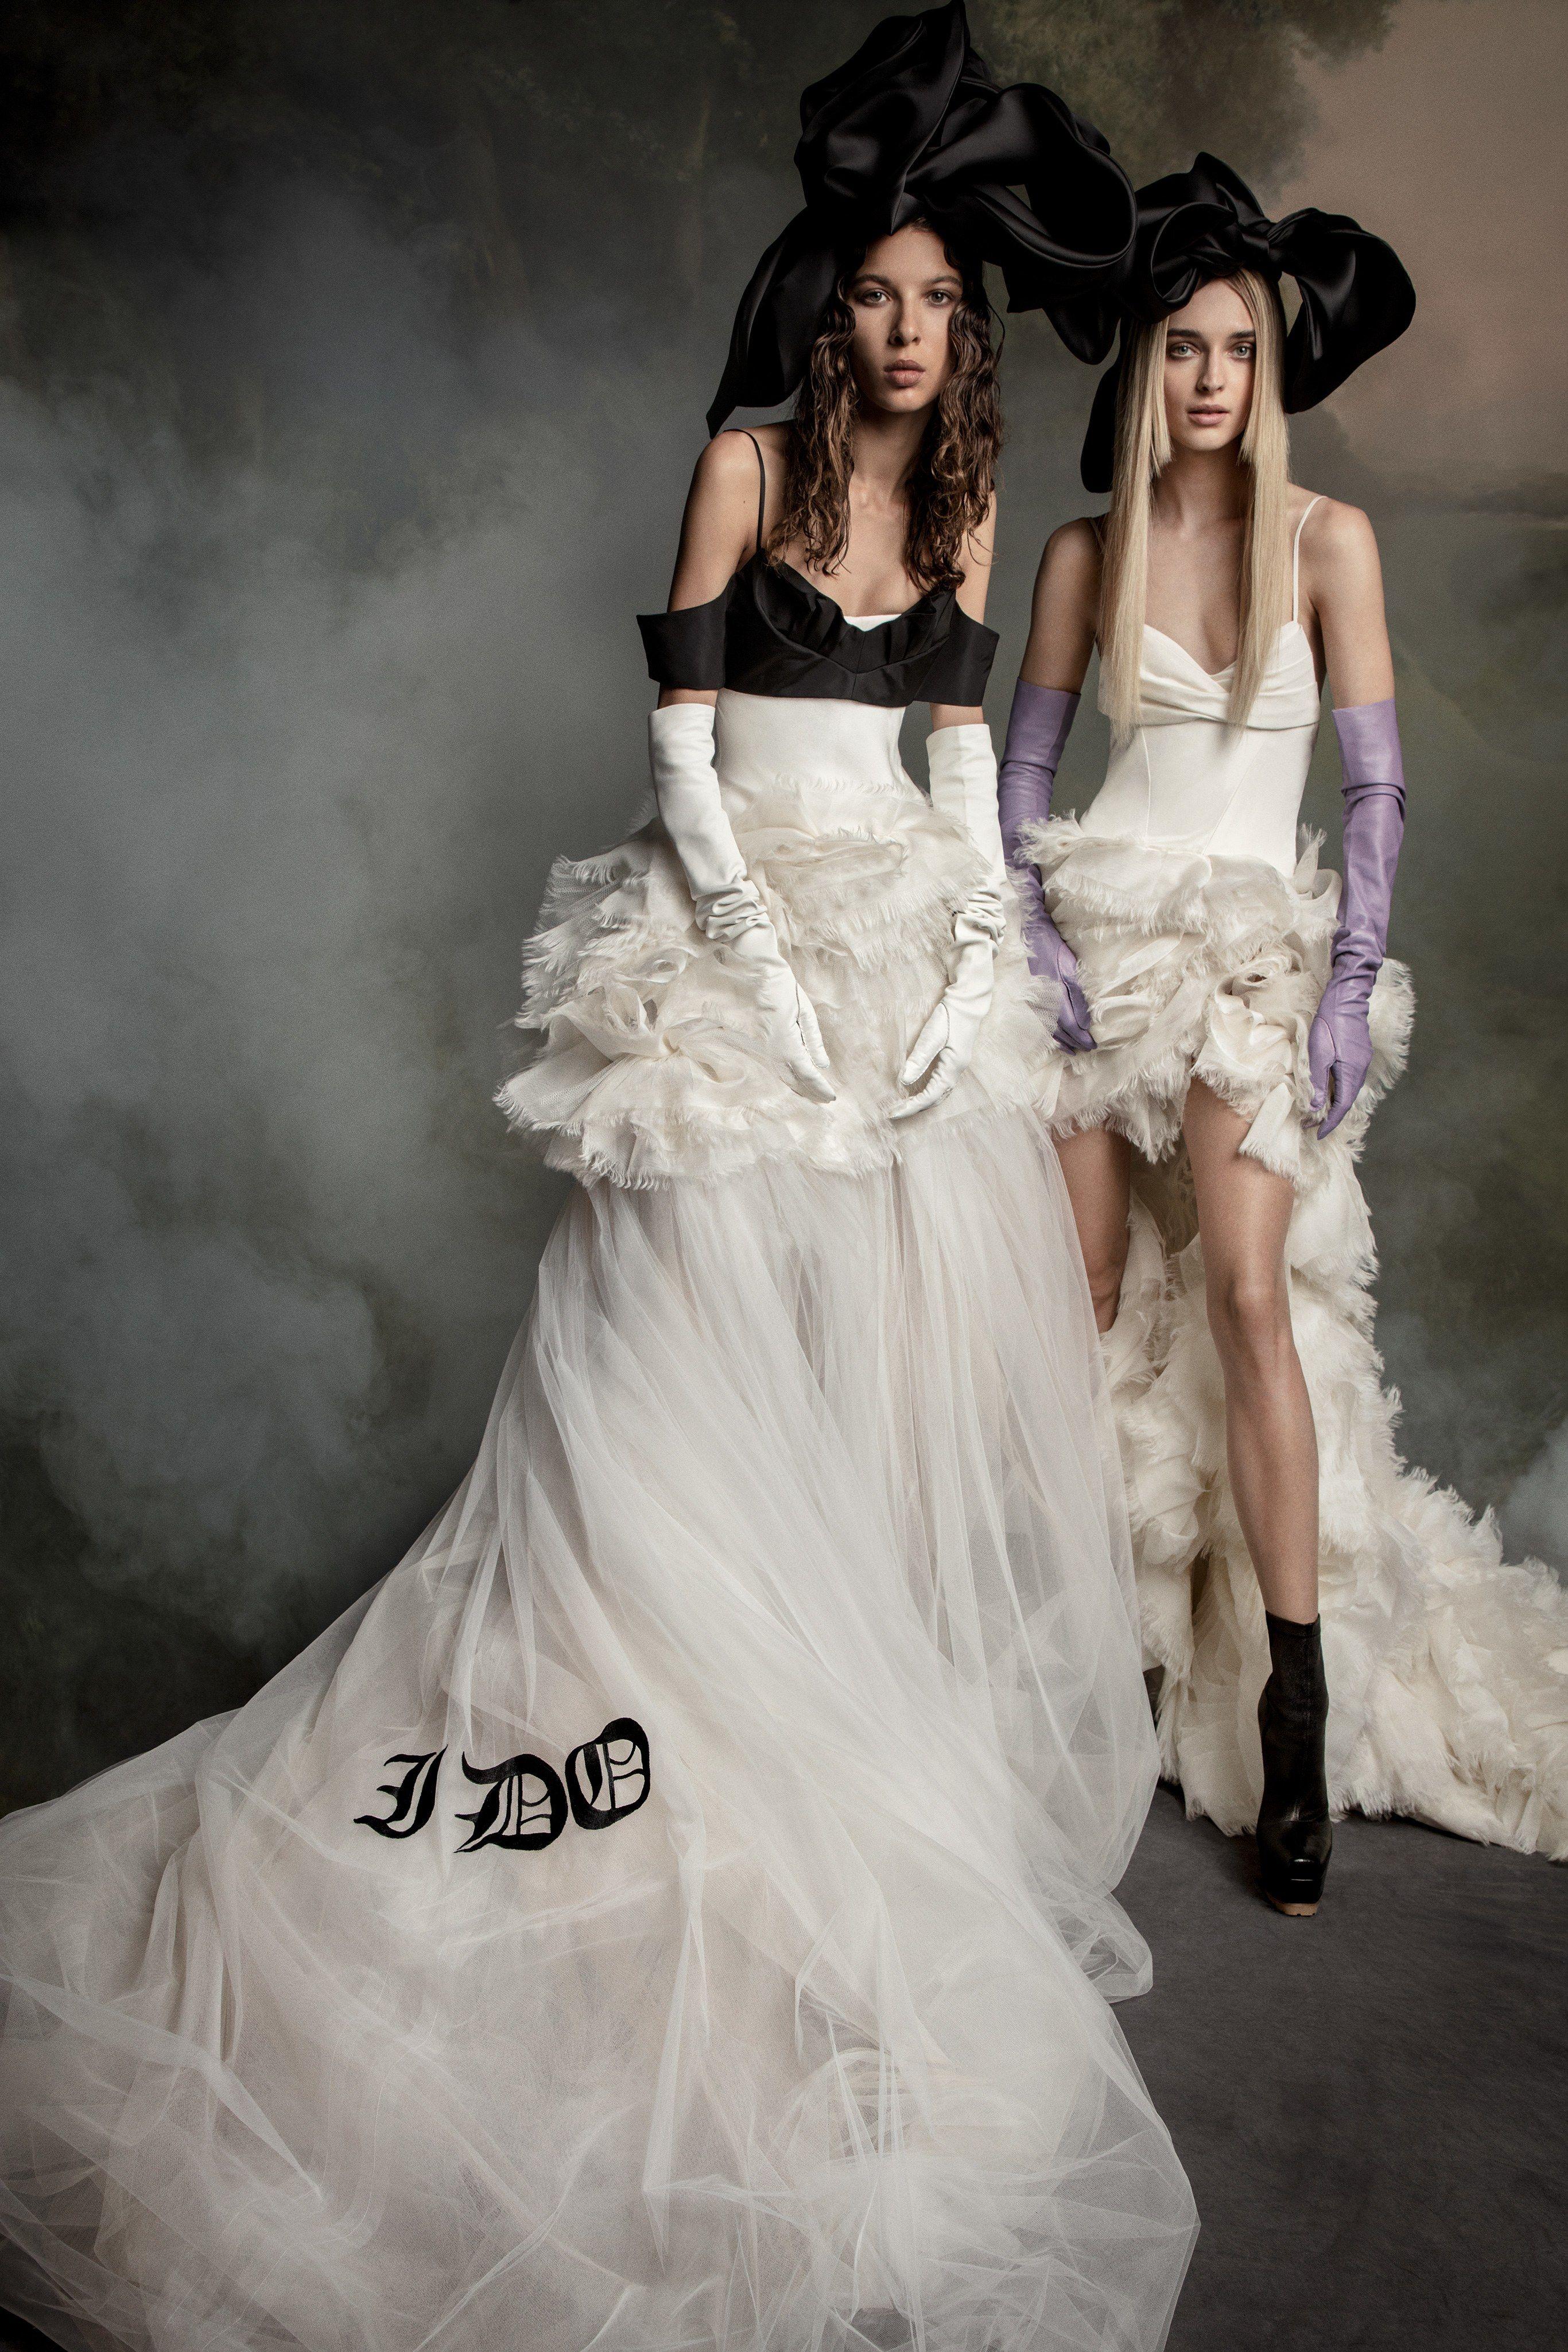 wedding shorts for bride